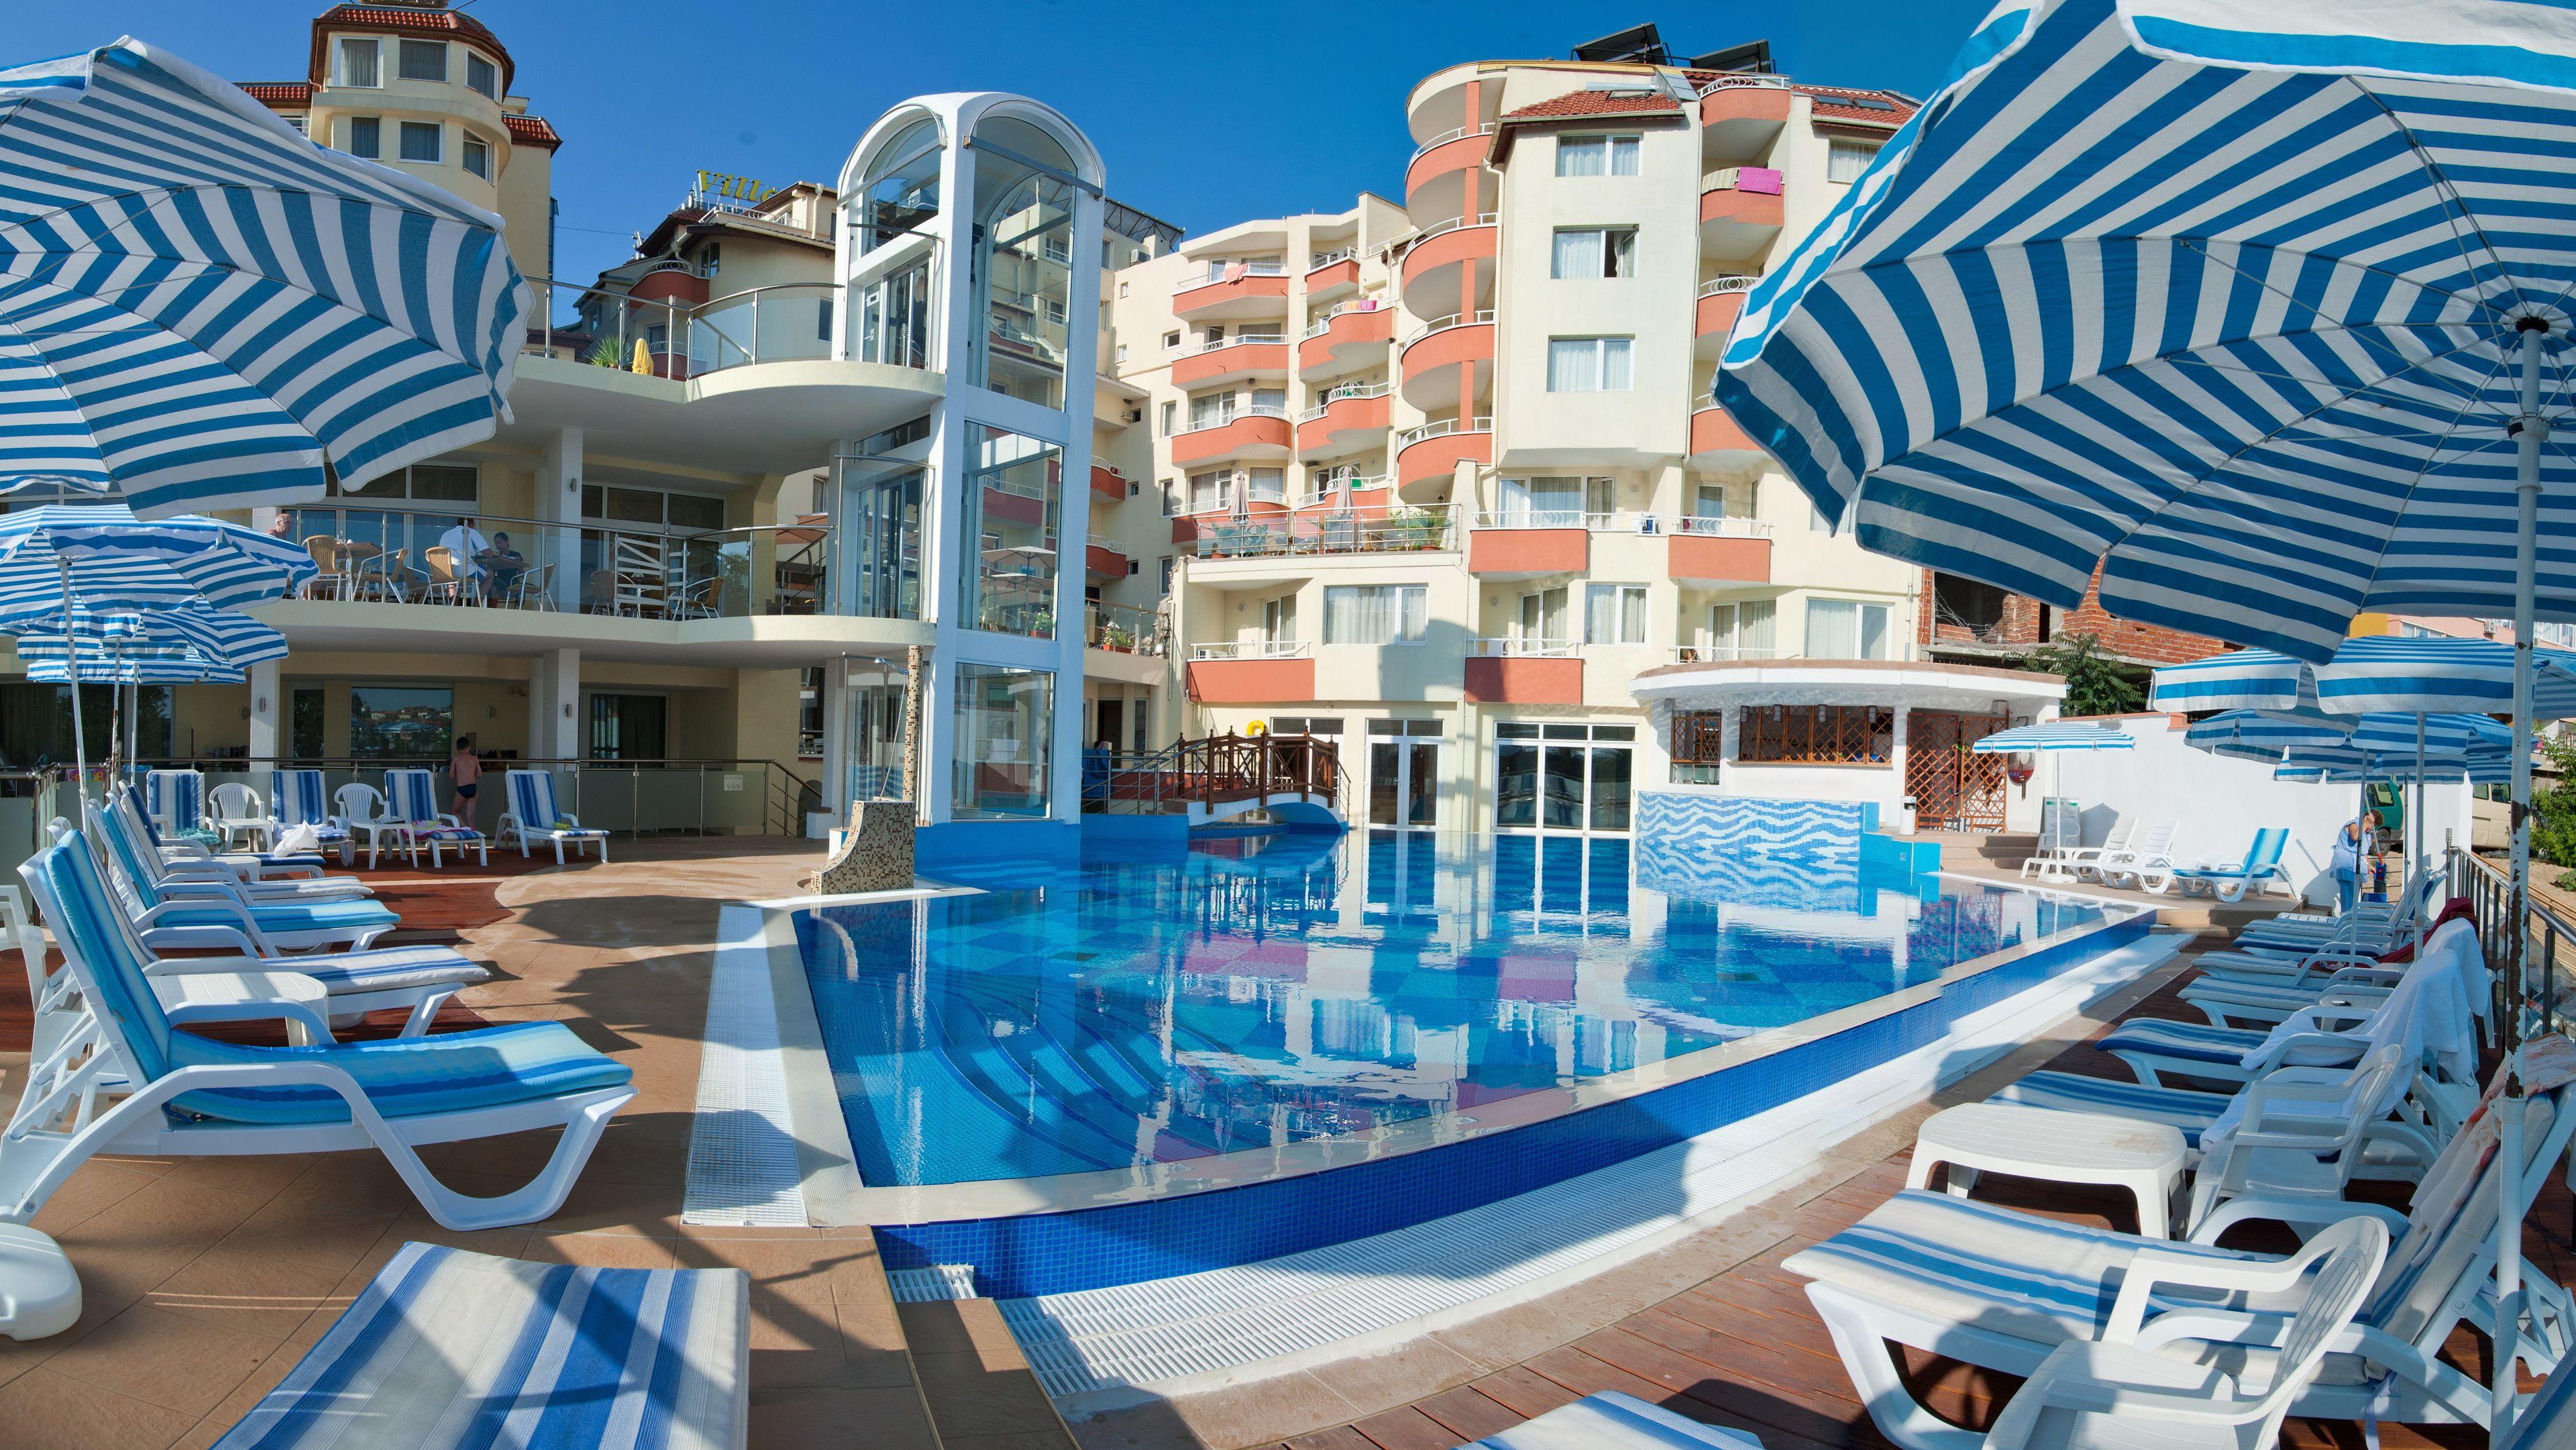 Courtesy of Villa List Hotel / Expedia